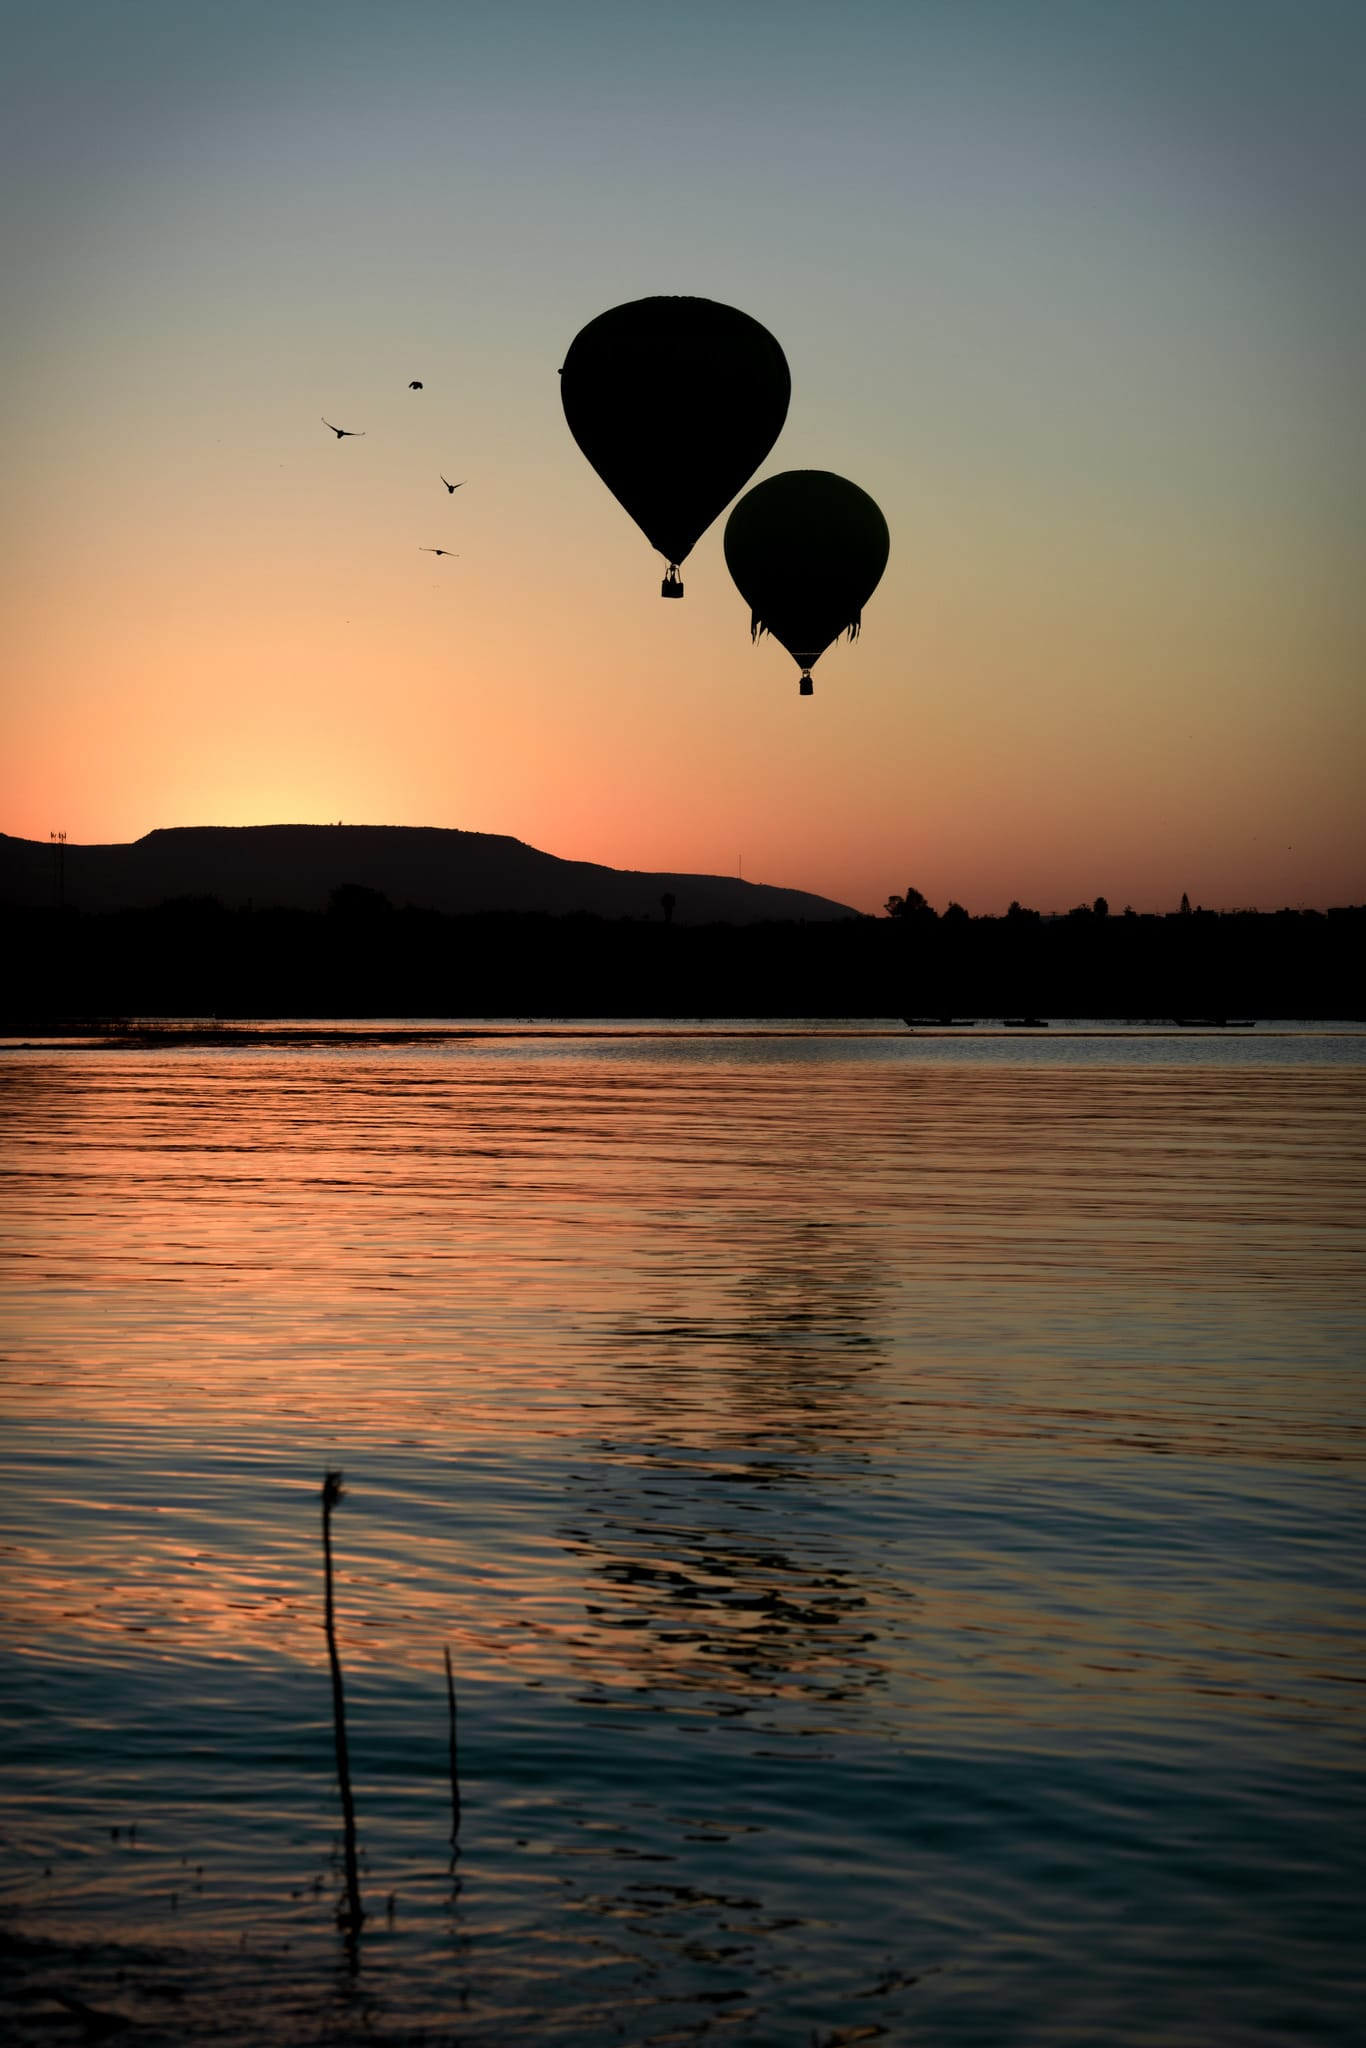 fotografía de dos globos en un atardecer